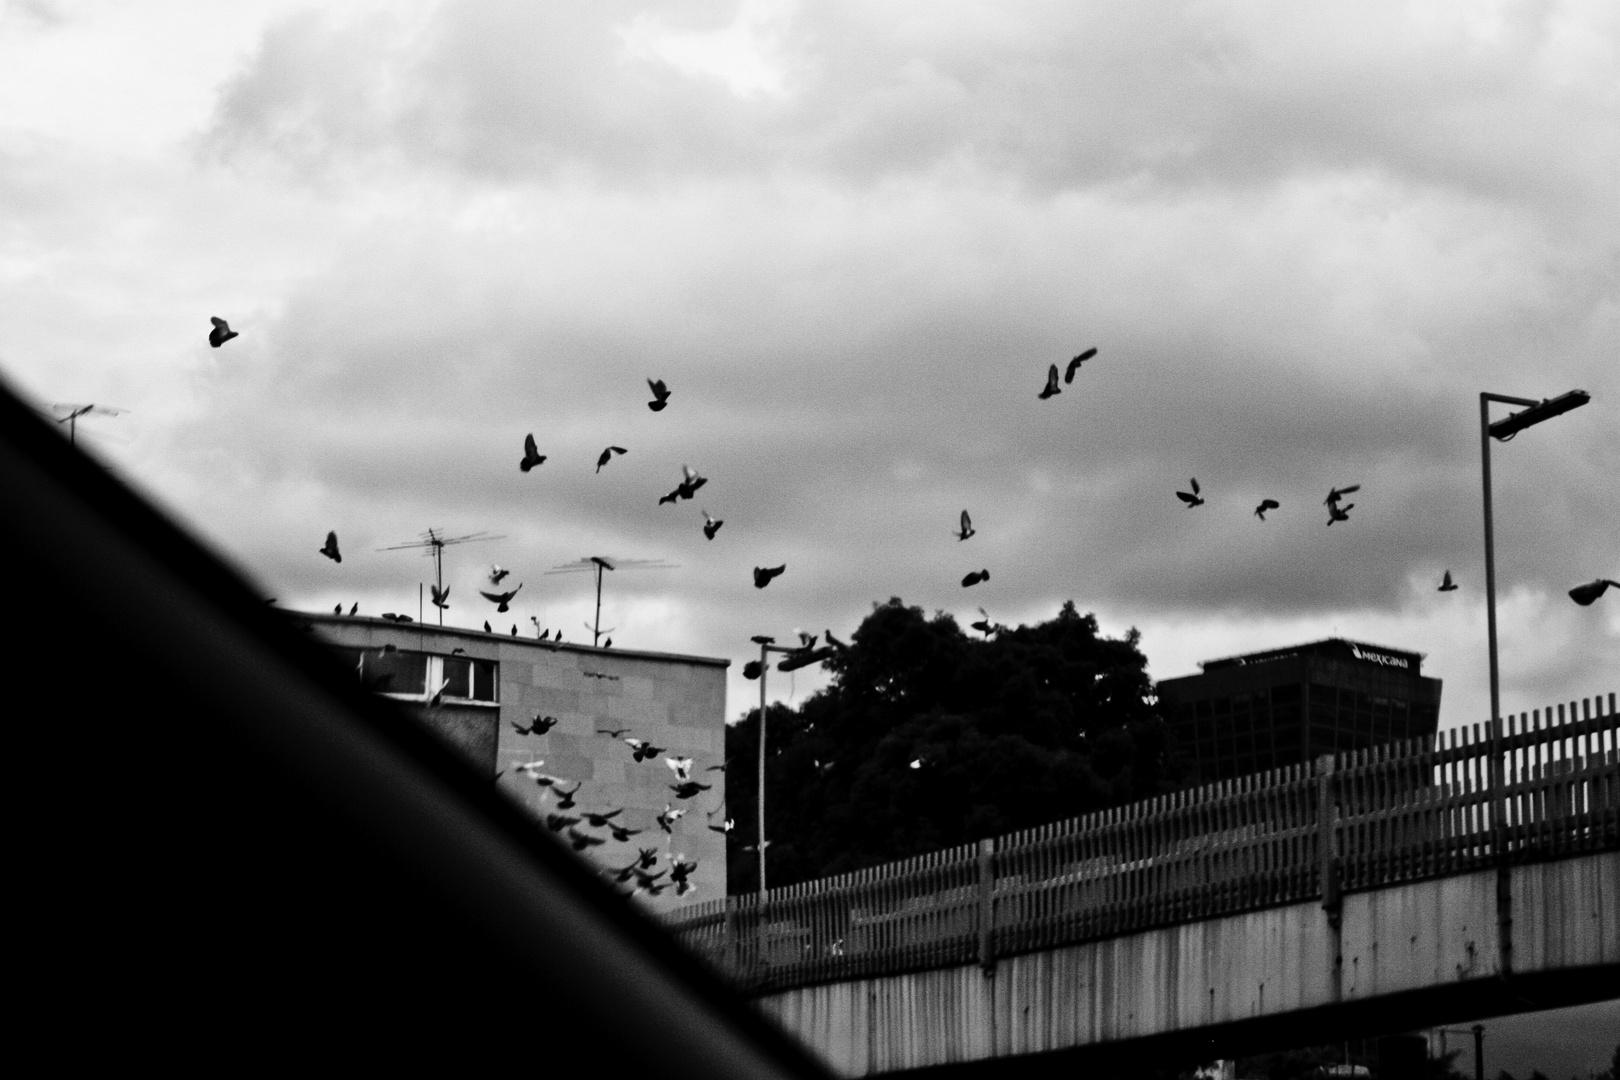 Parafernalia aviar